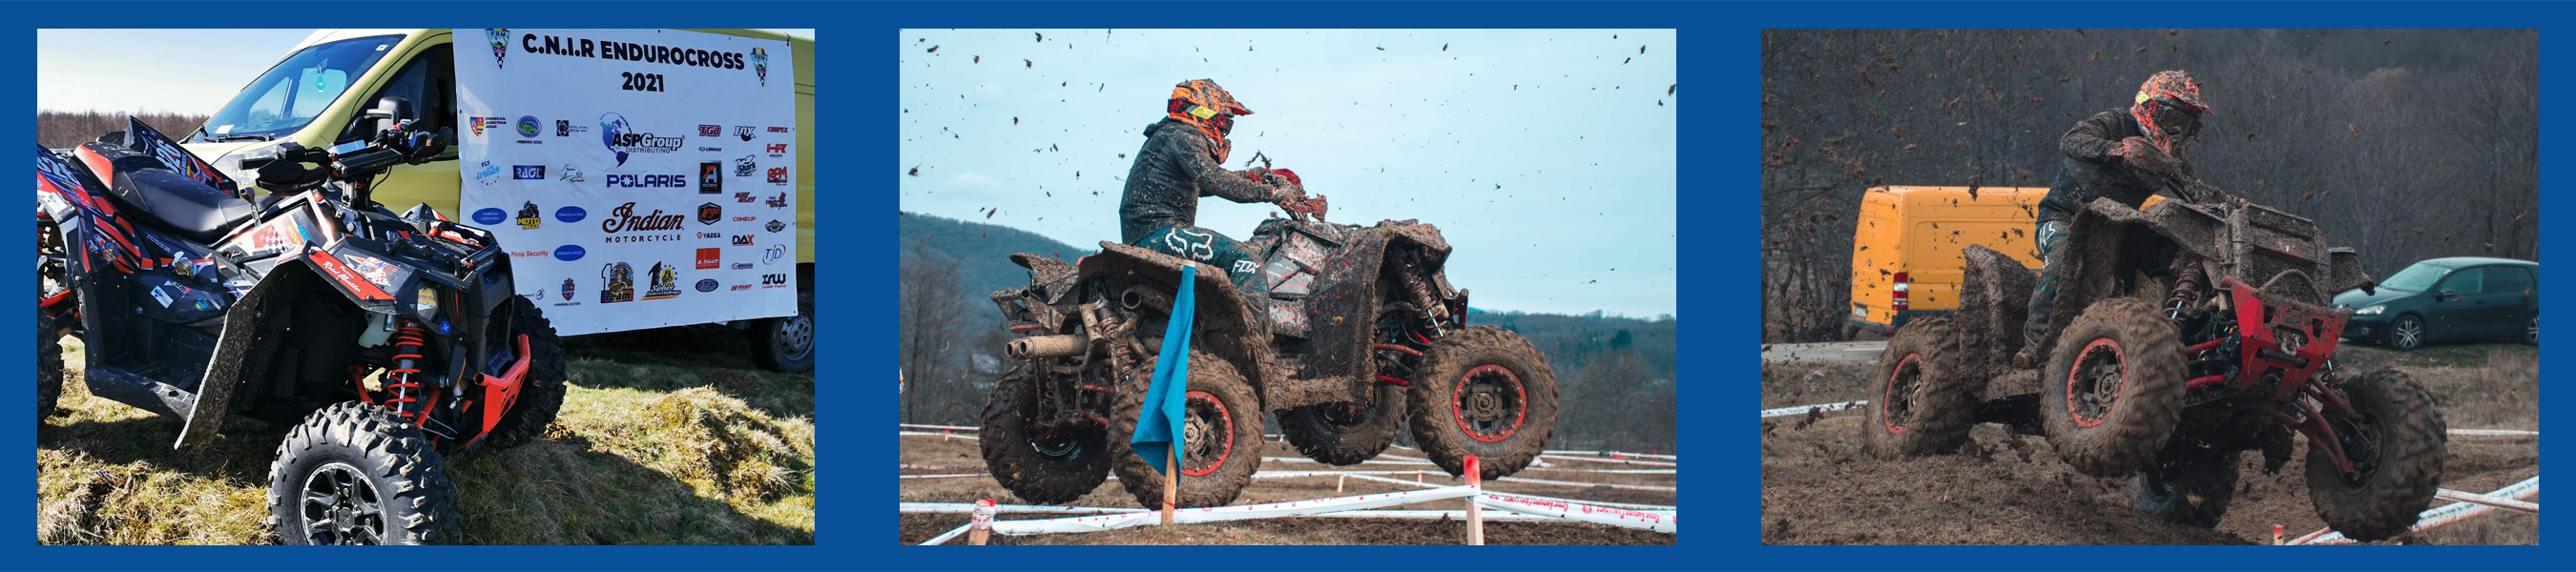 Polaris, sponsor CNIR Endurocross 2021